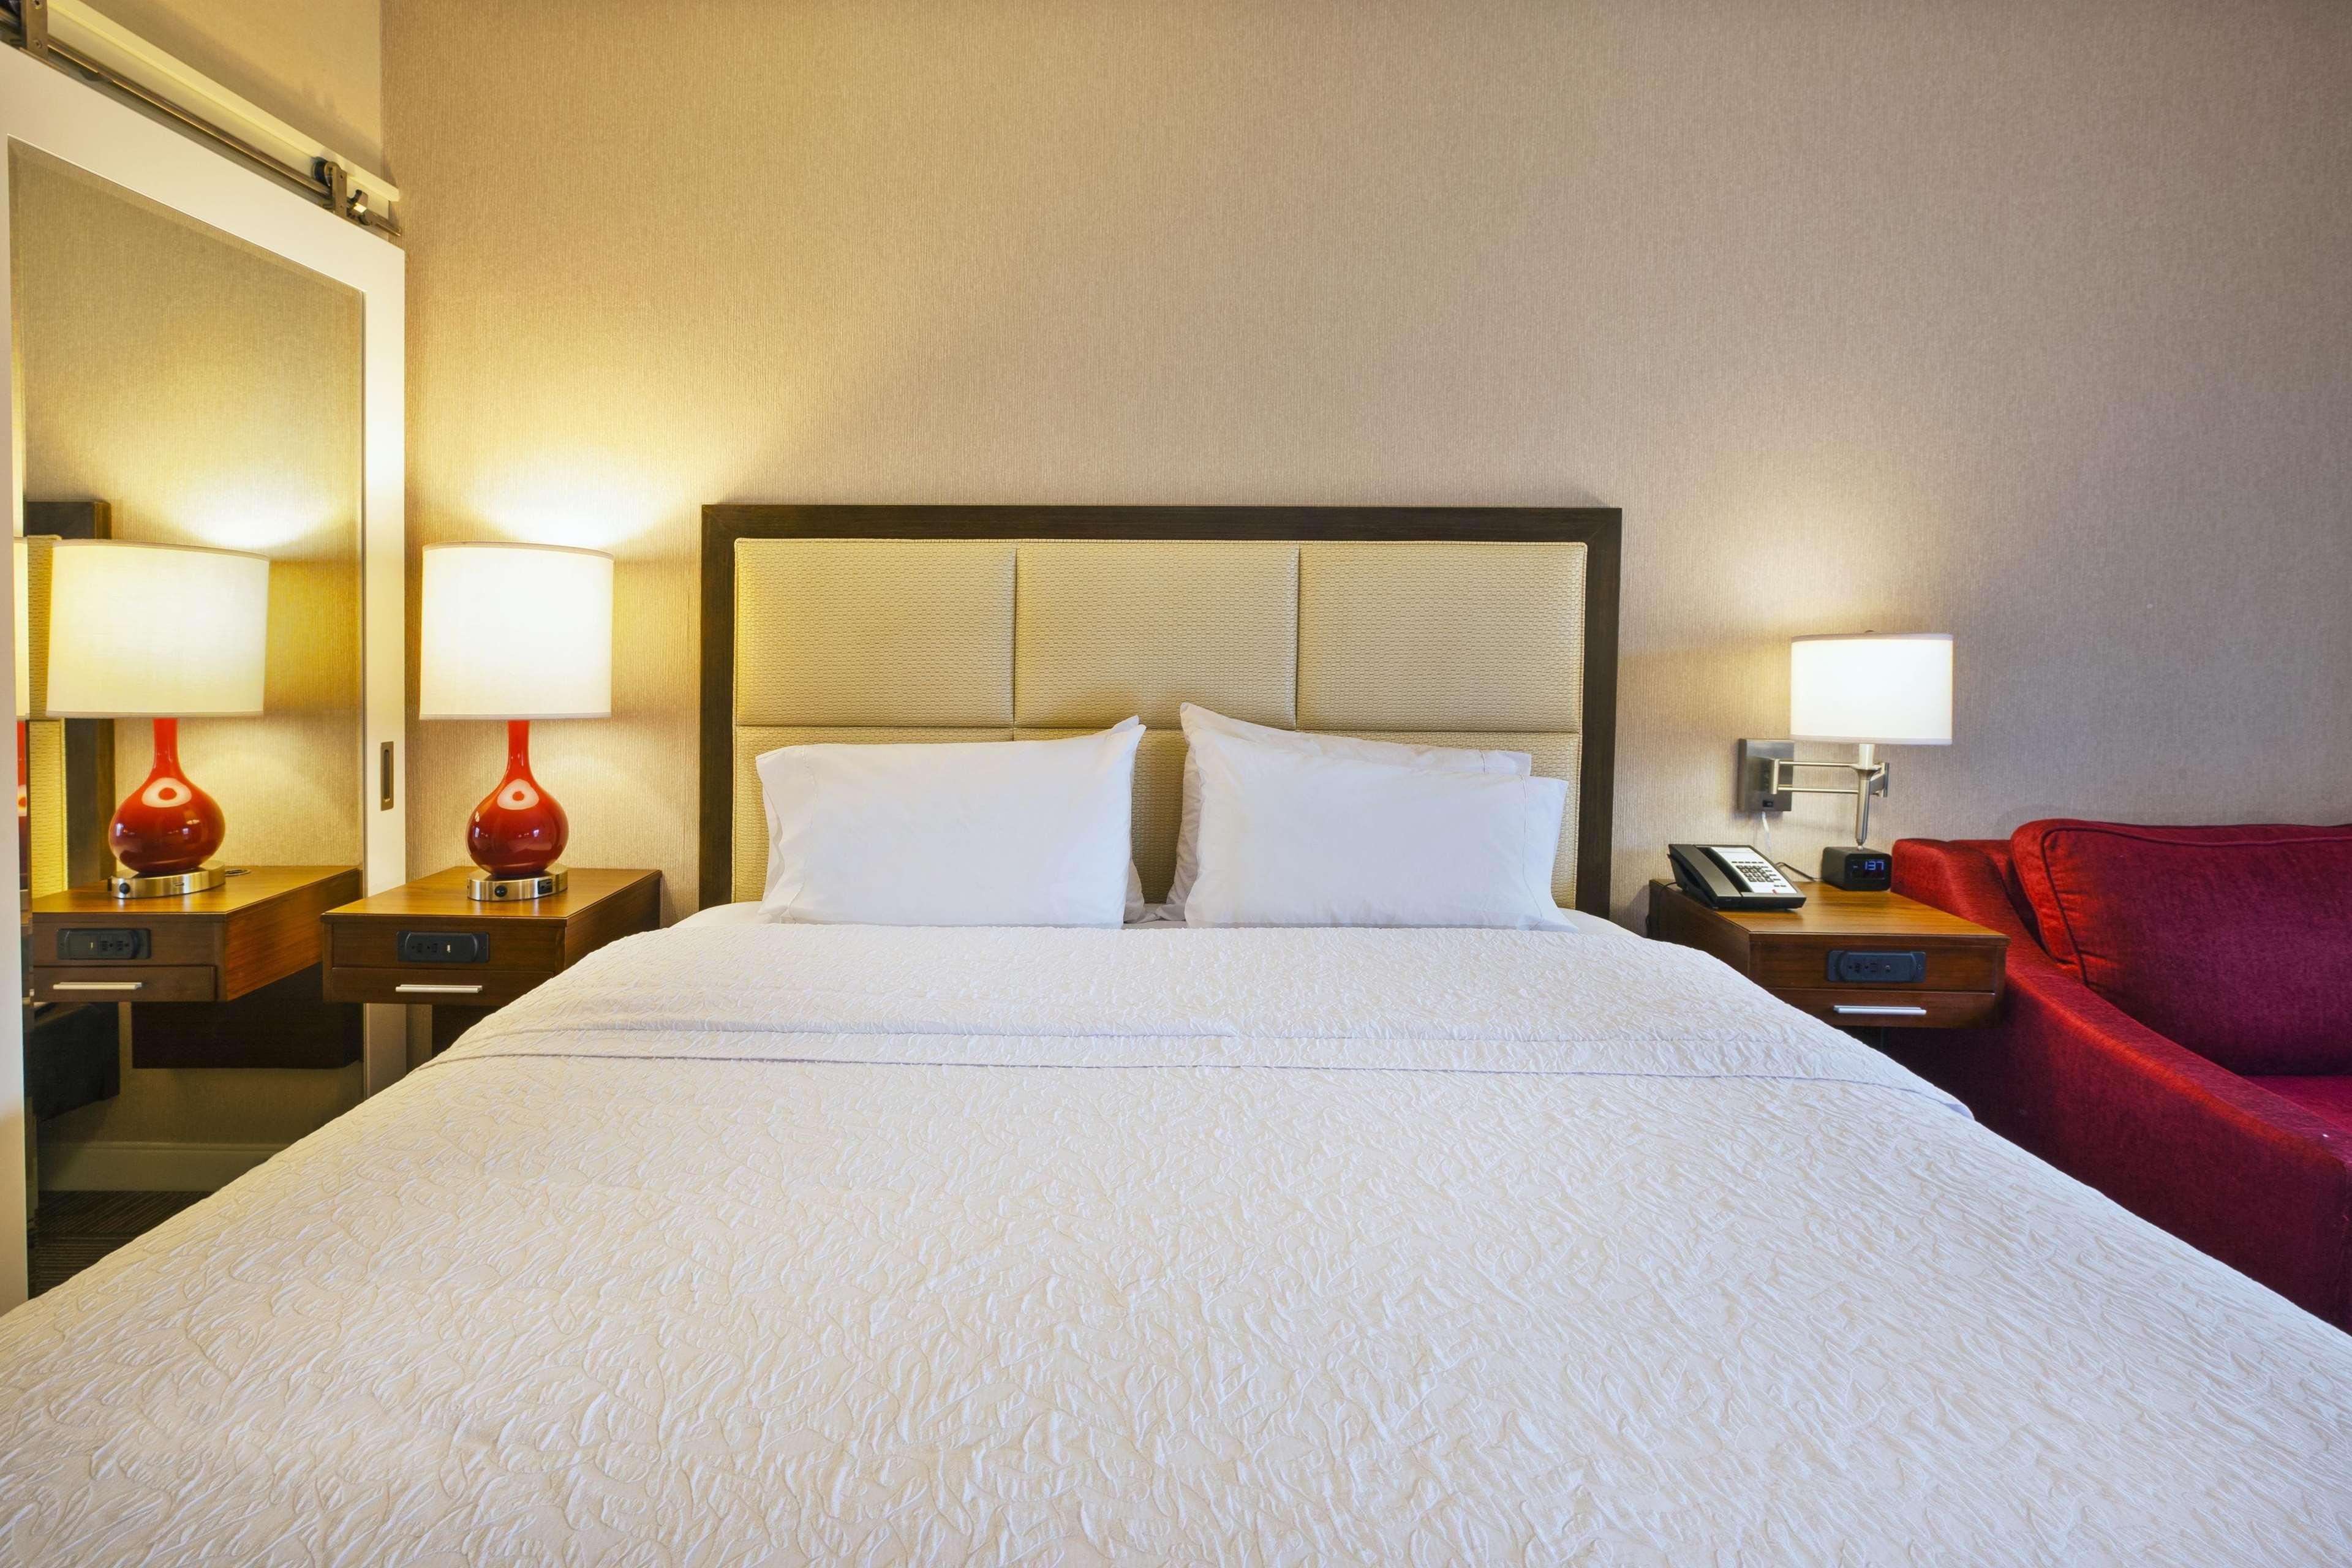 Hampton Inn & Suites Providence/Warwick-Airport image 48